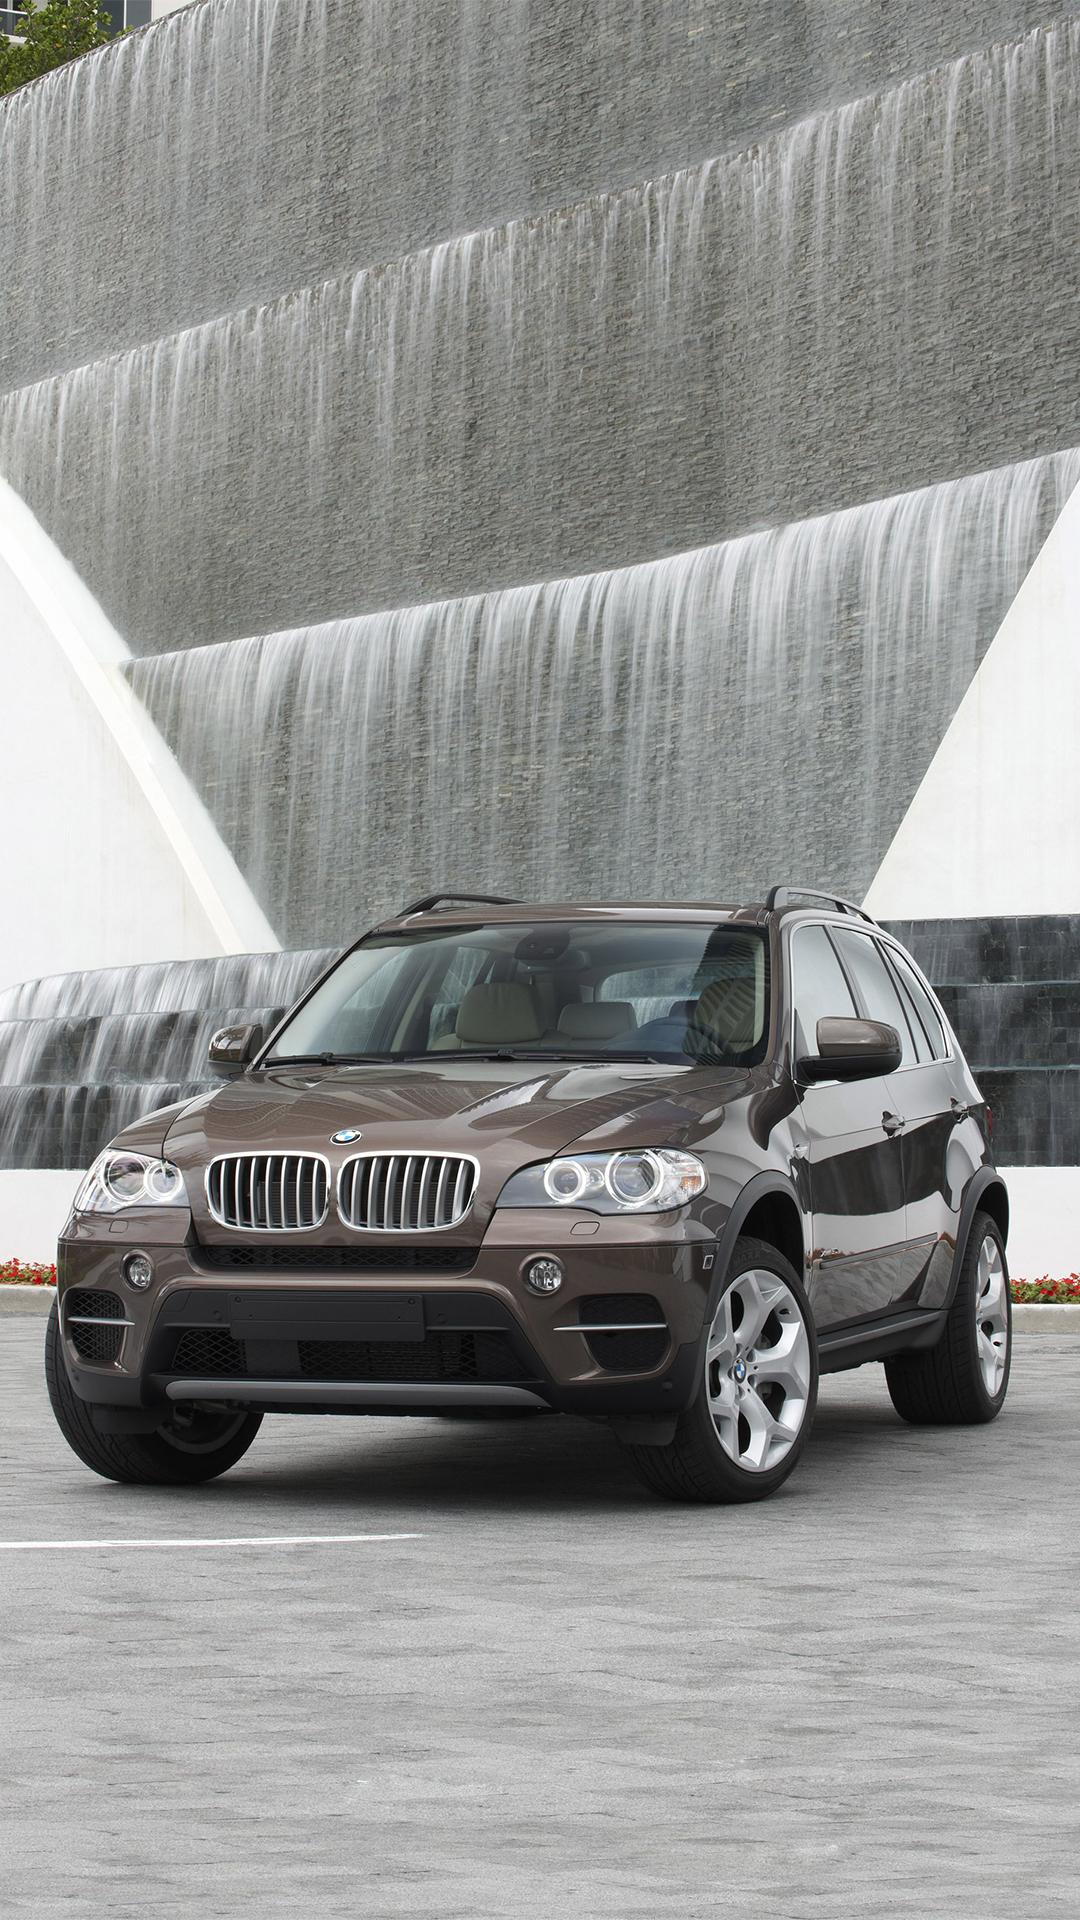 2011 BMW X5 htc one wallpaper